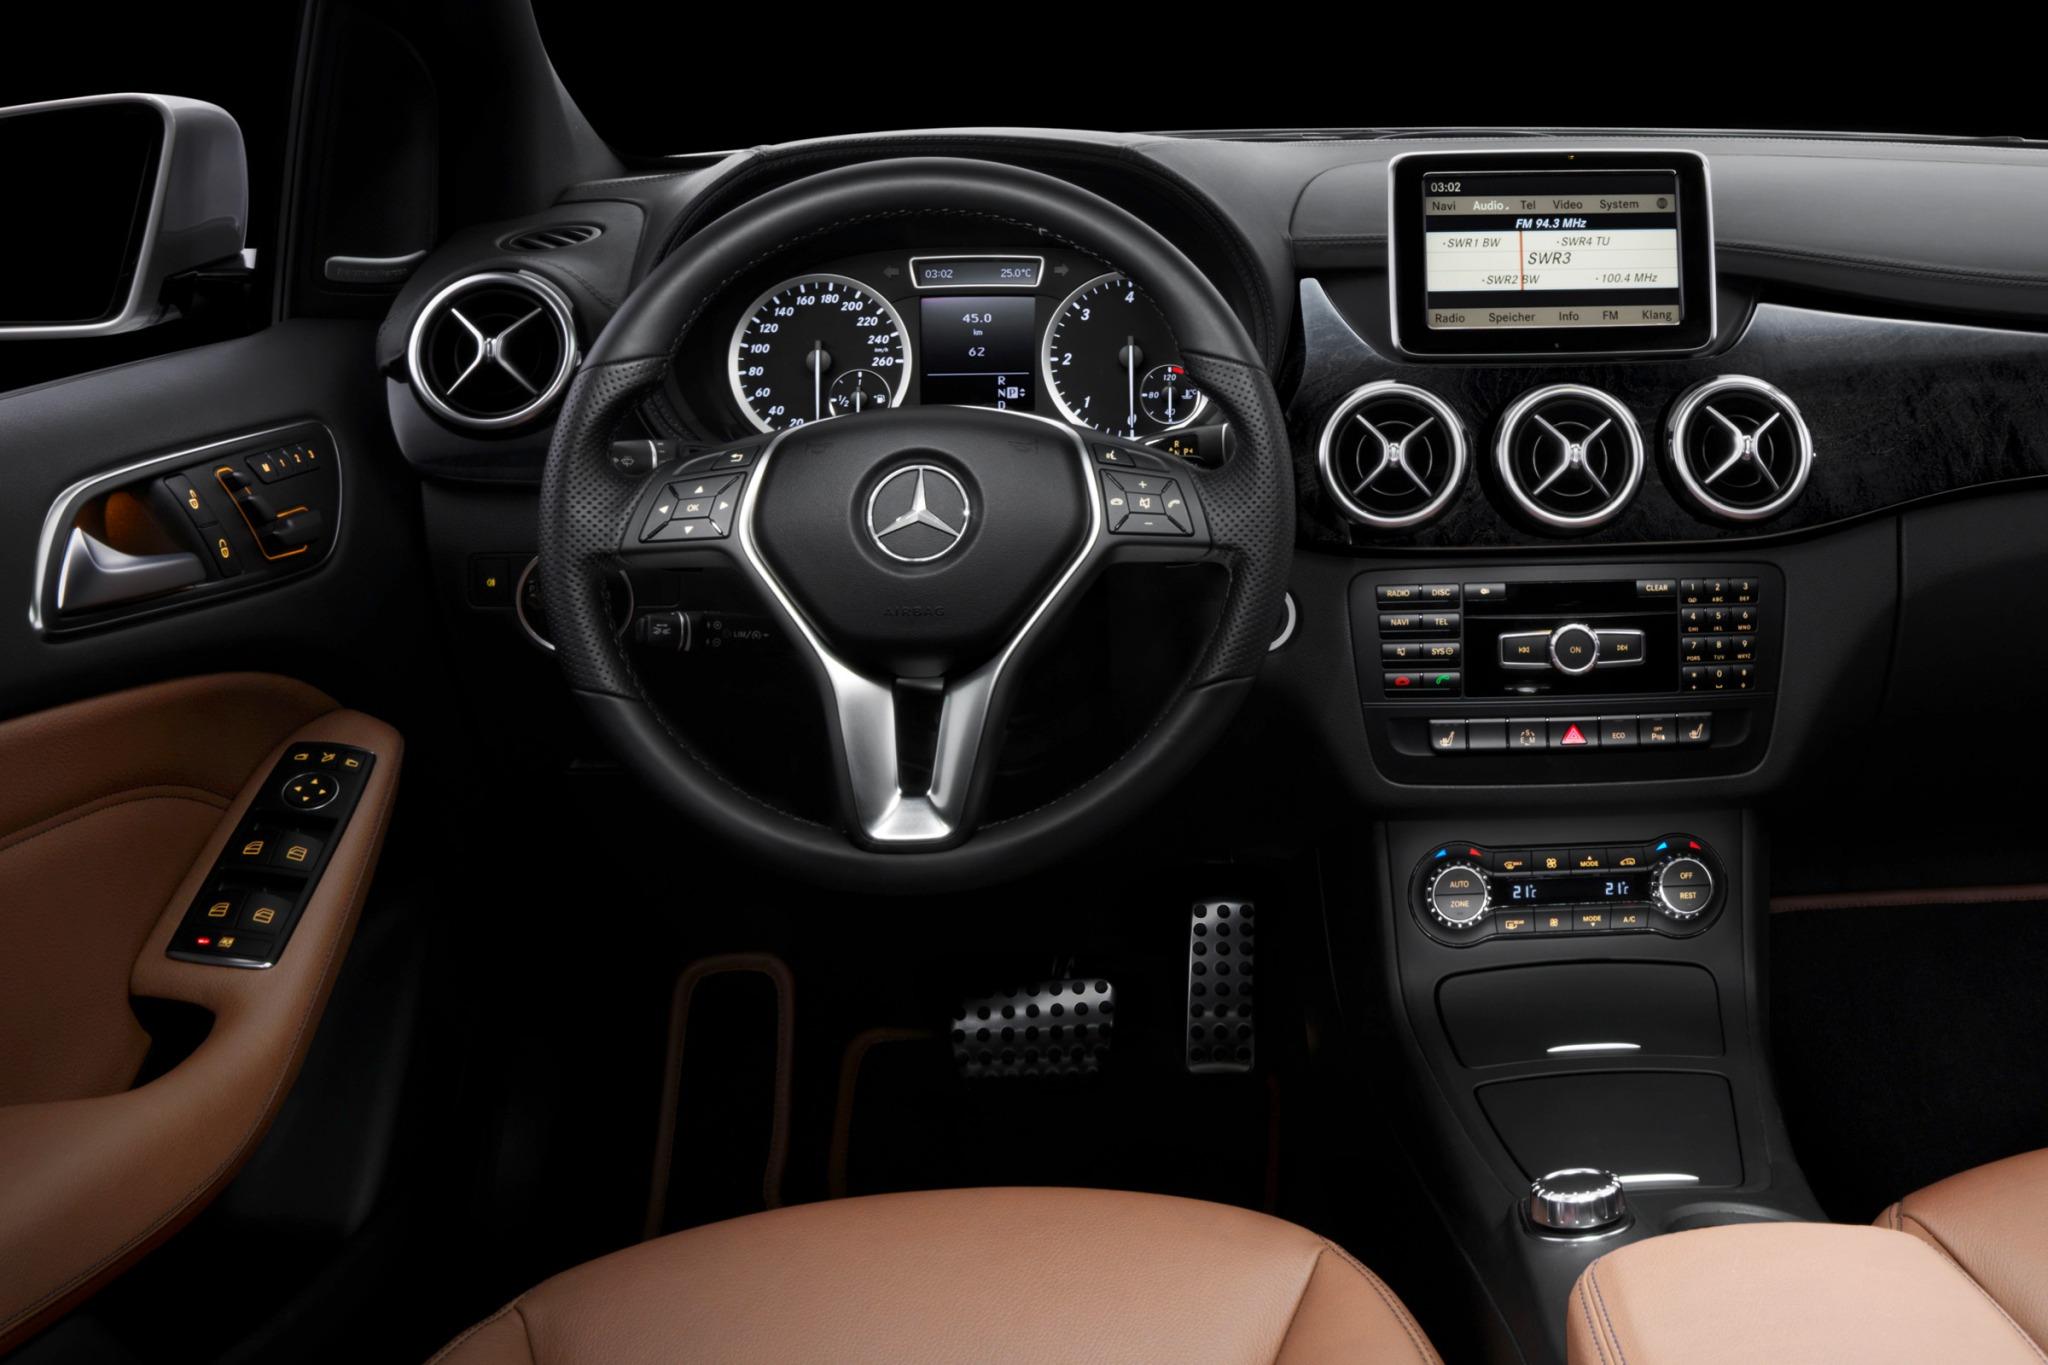 2014 Mercedes Benz B Class Electric Drive Image 5